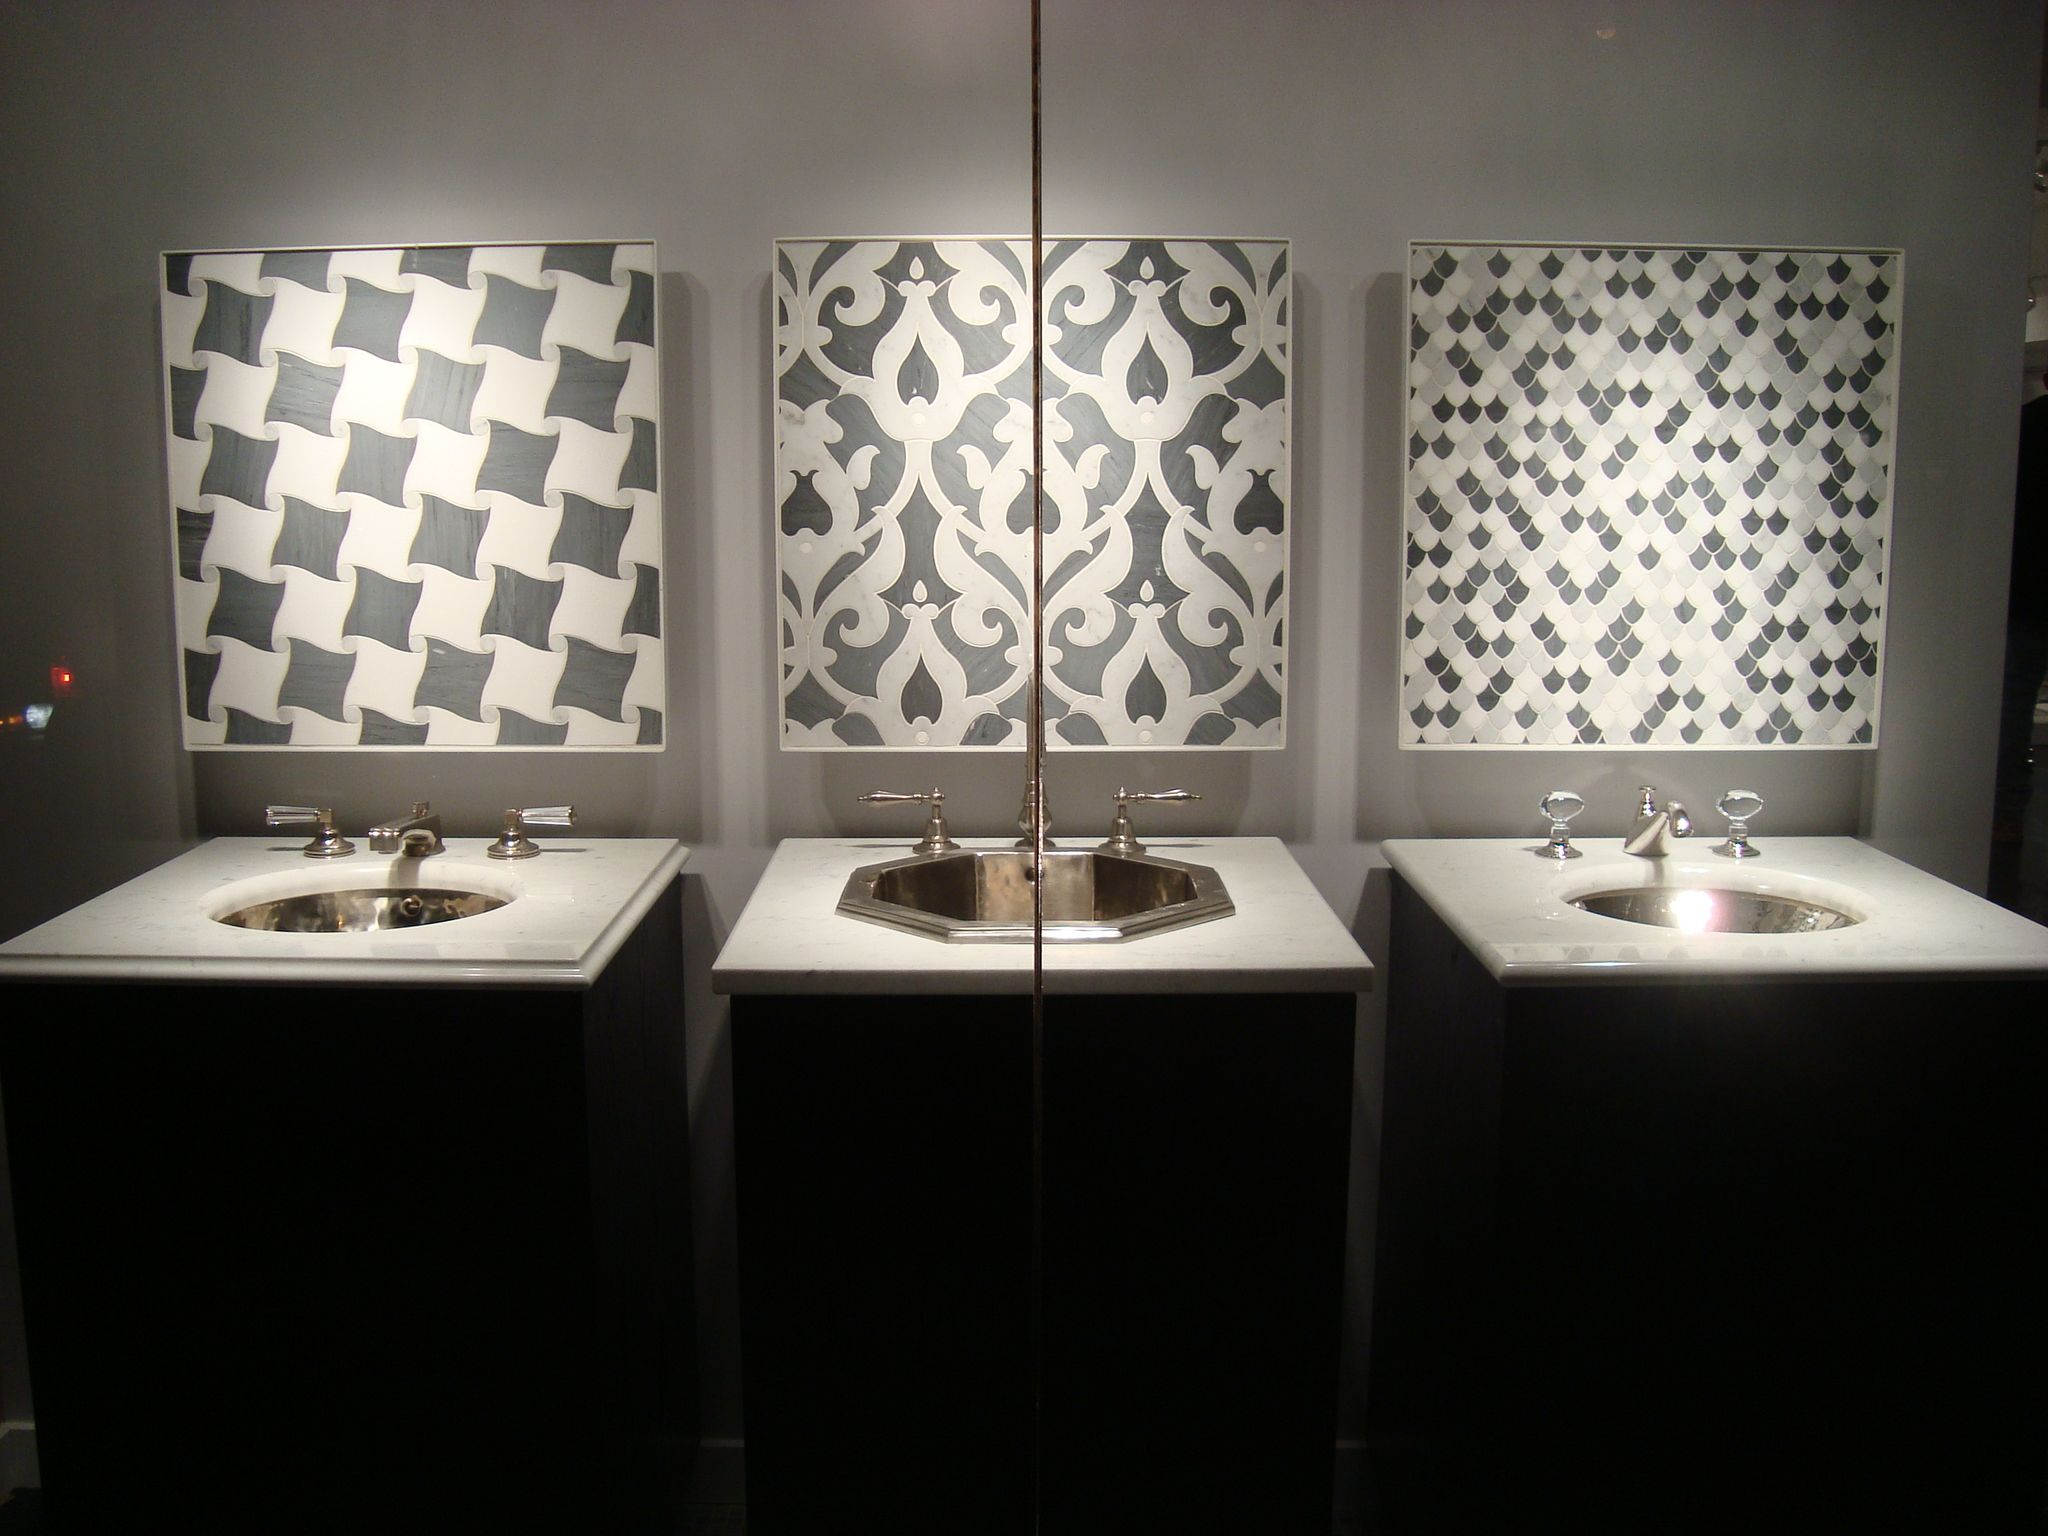 Waterworks 58th Street, New York Showroom Kitchen & Mosaic Window ...